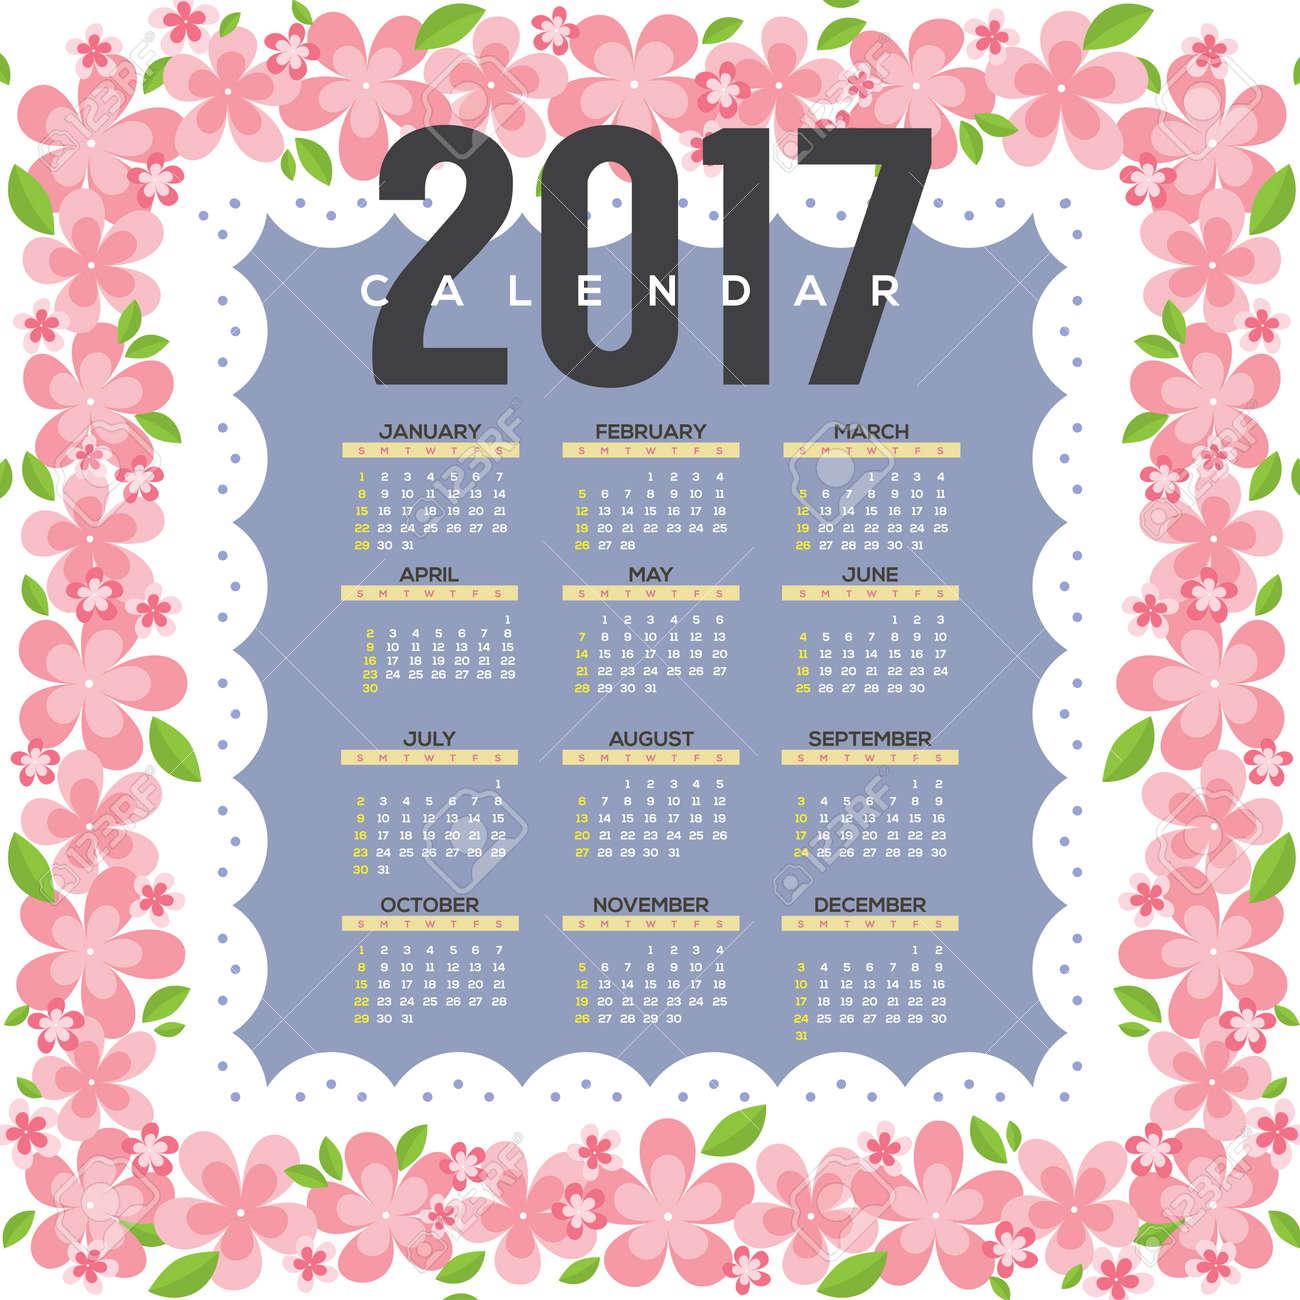 Astonishing 2017 Printable Calendar Starts Sunday Pink Flowers Border Vector Download Free Architecture Designs Scobabritishbridgeorg